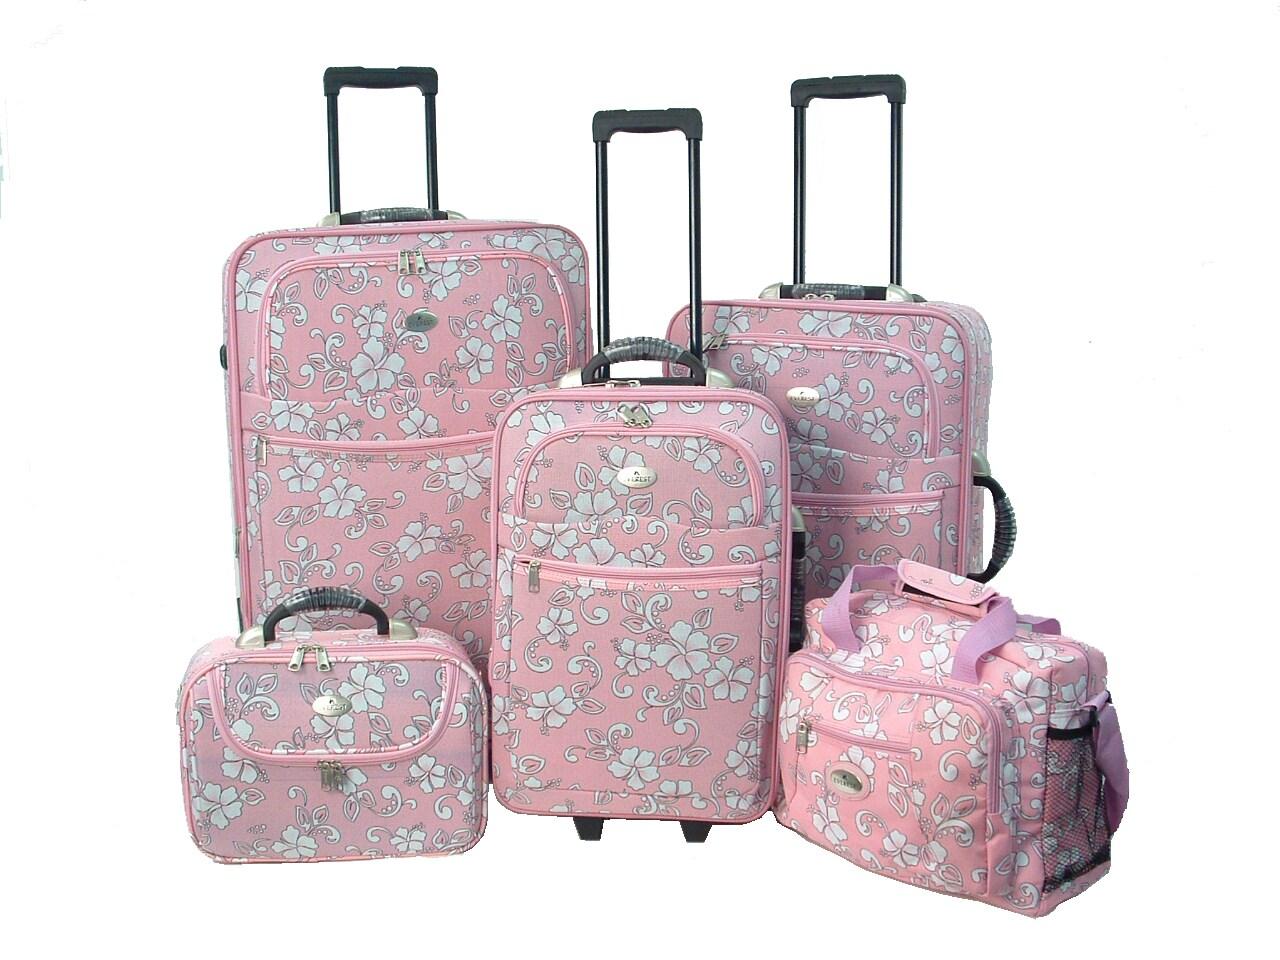 Hawaiian Luggage Sets Luggage Set With Free Tote